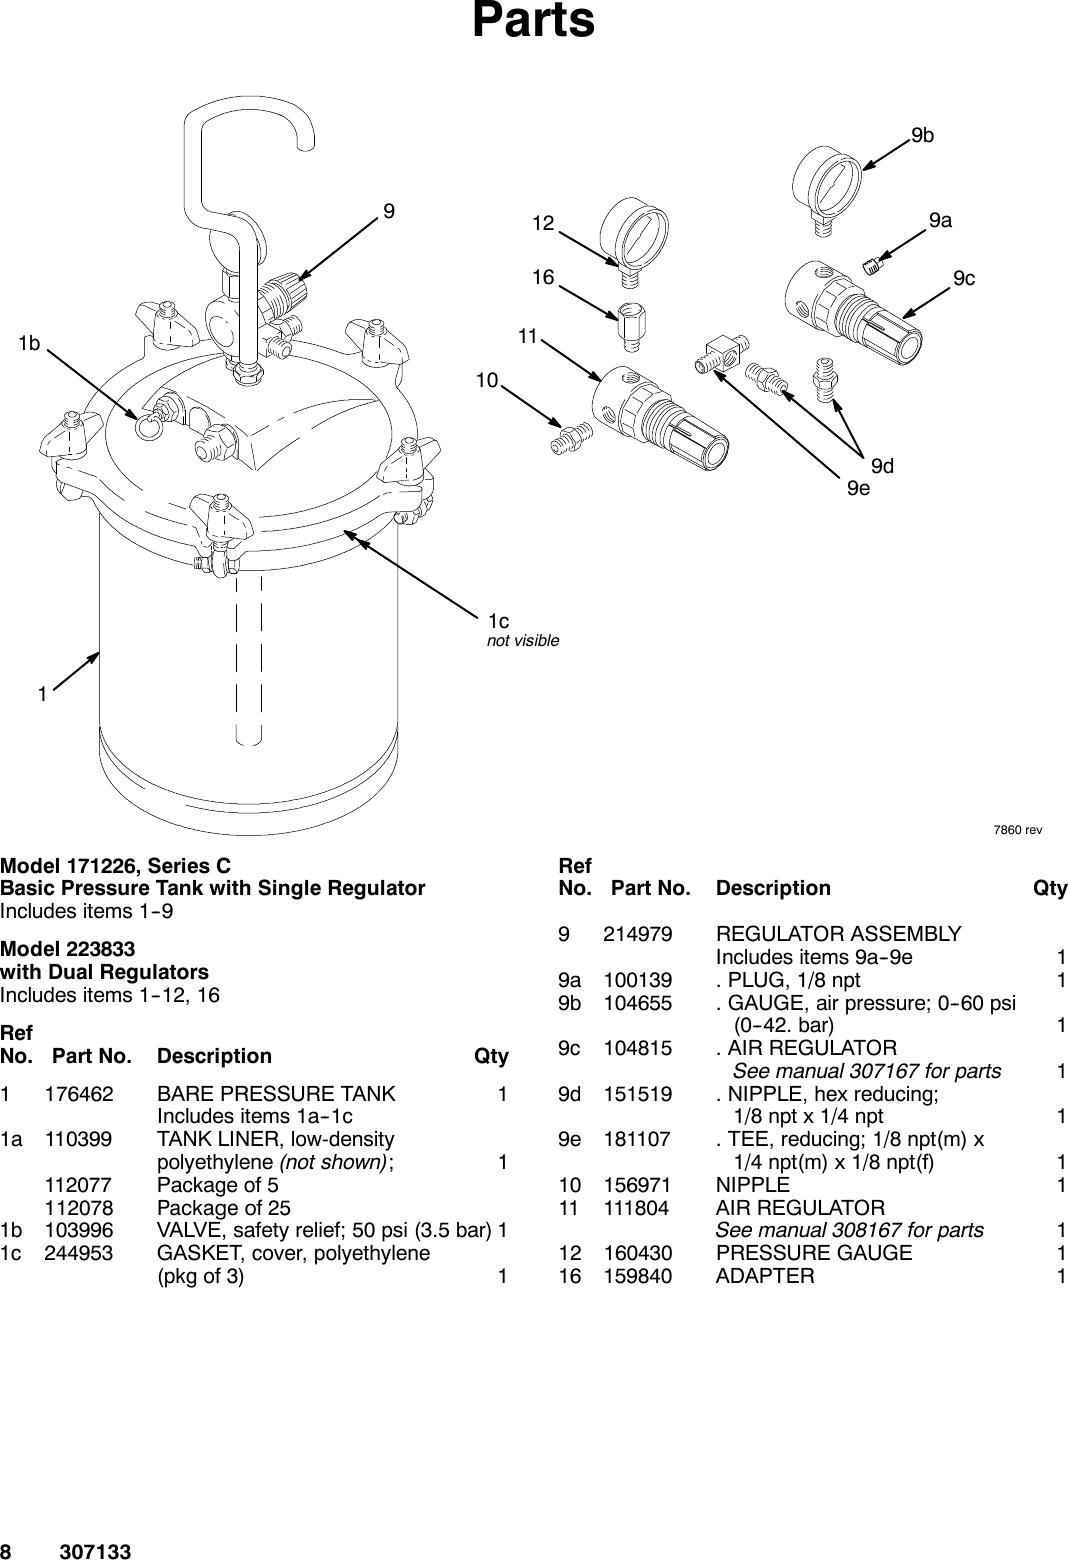 Graco 307133M 2 5 Gallon Pressure Tank Users Manual 2.5